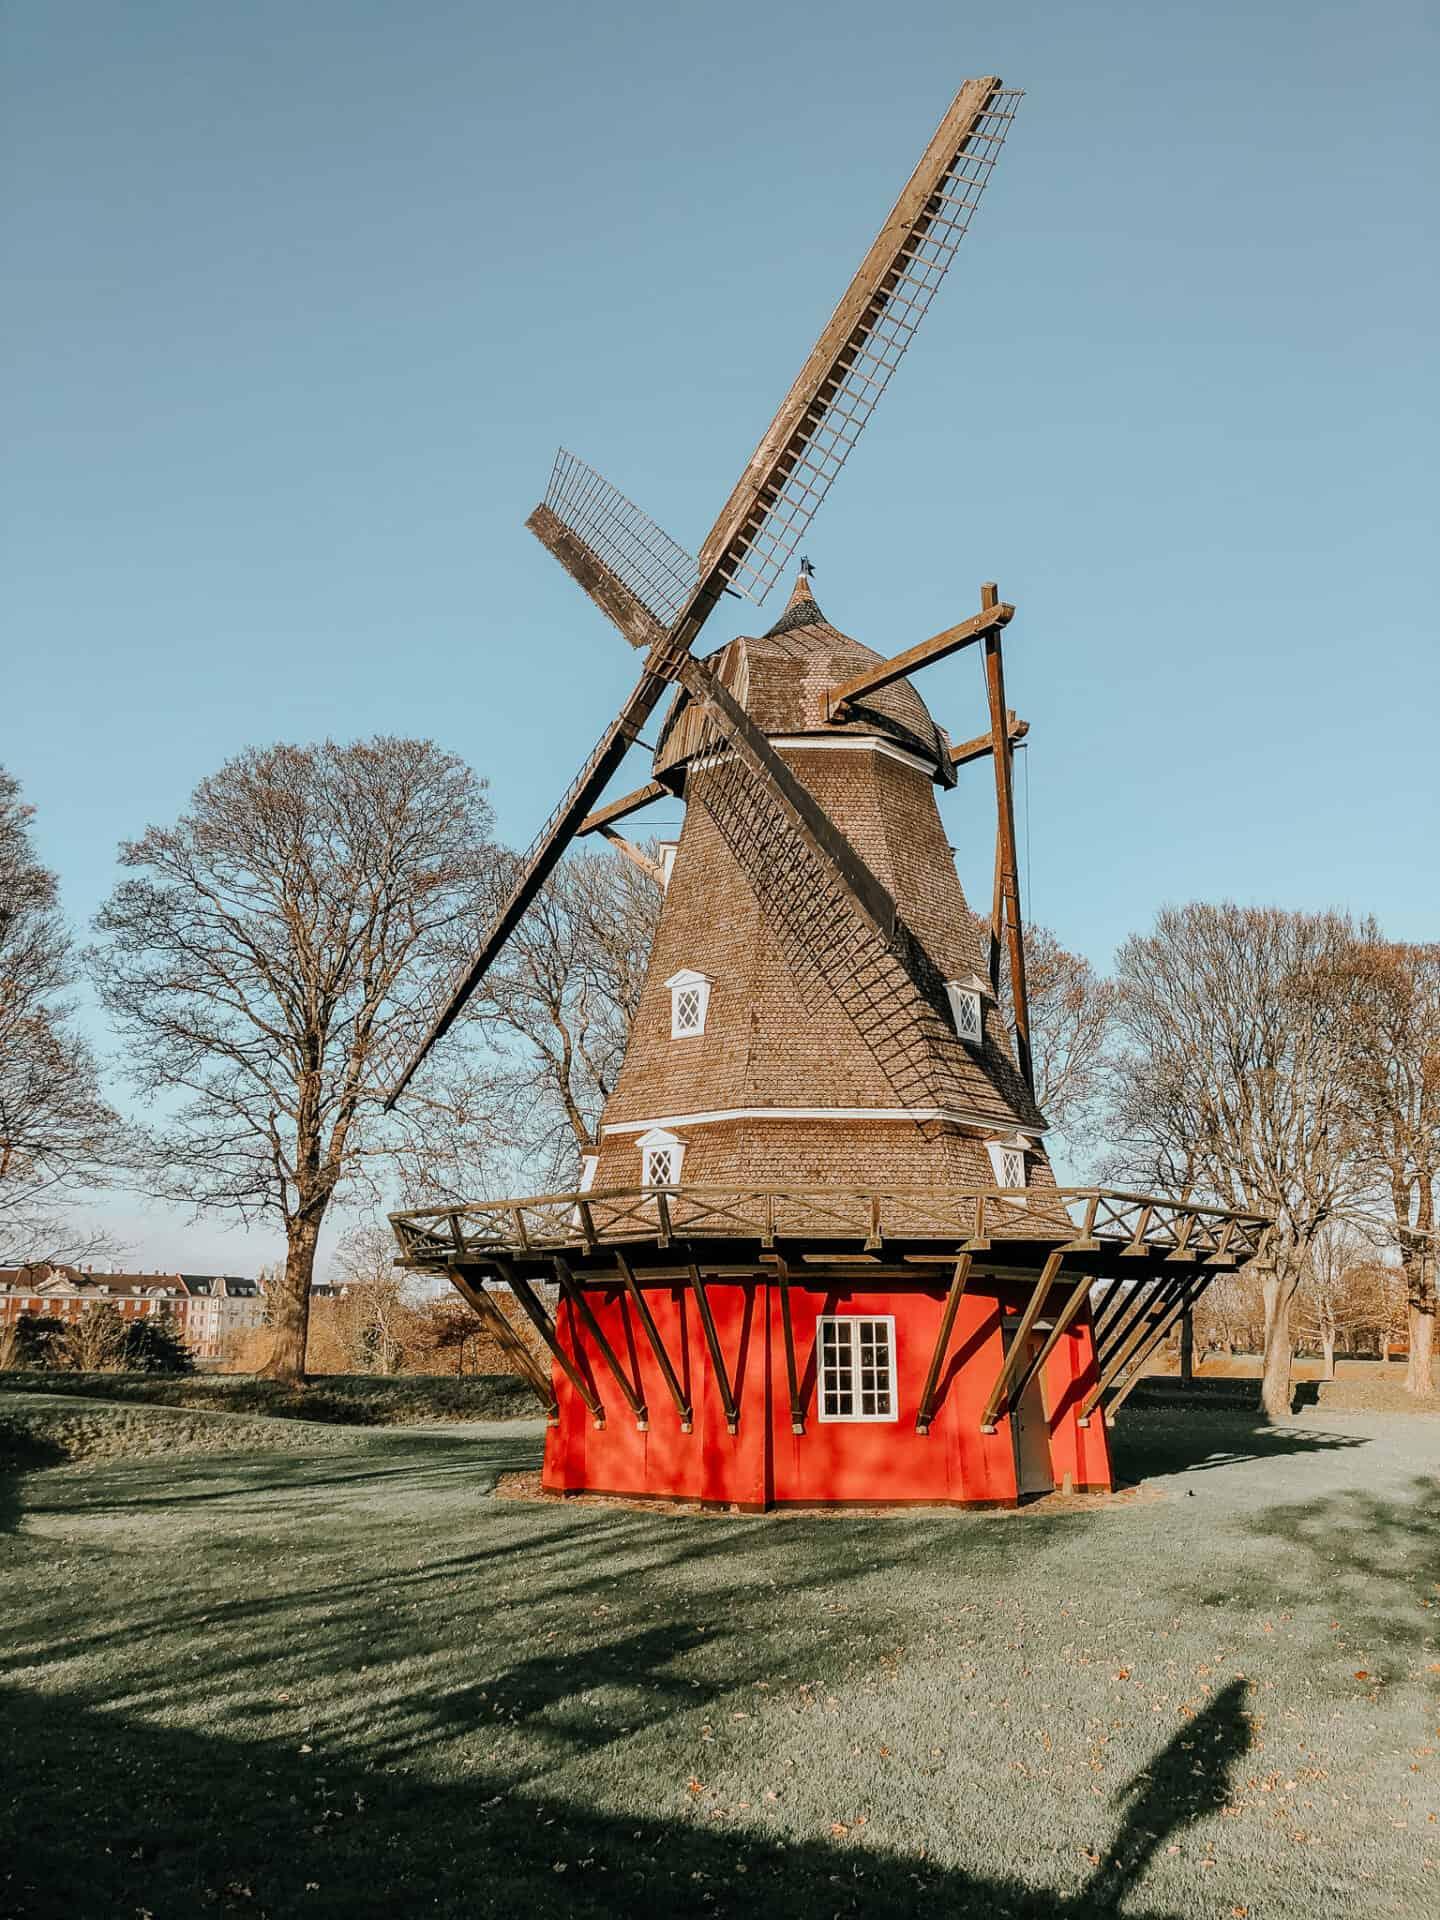 Windmill standing in a field